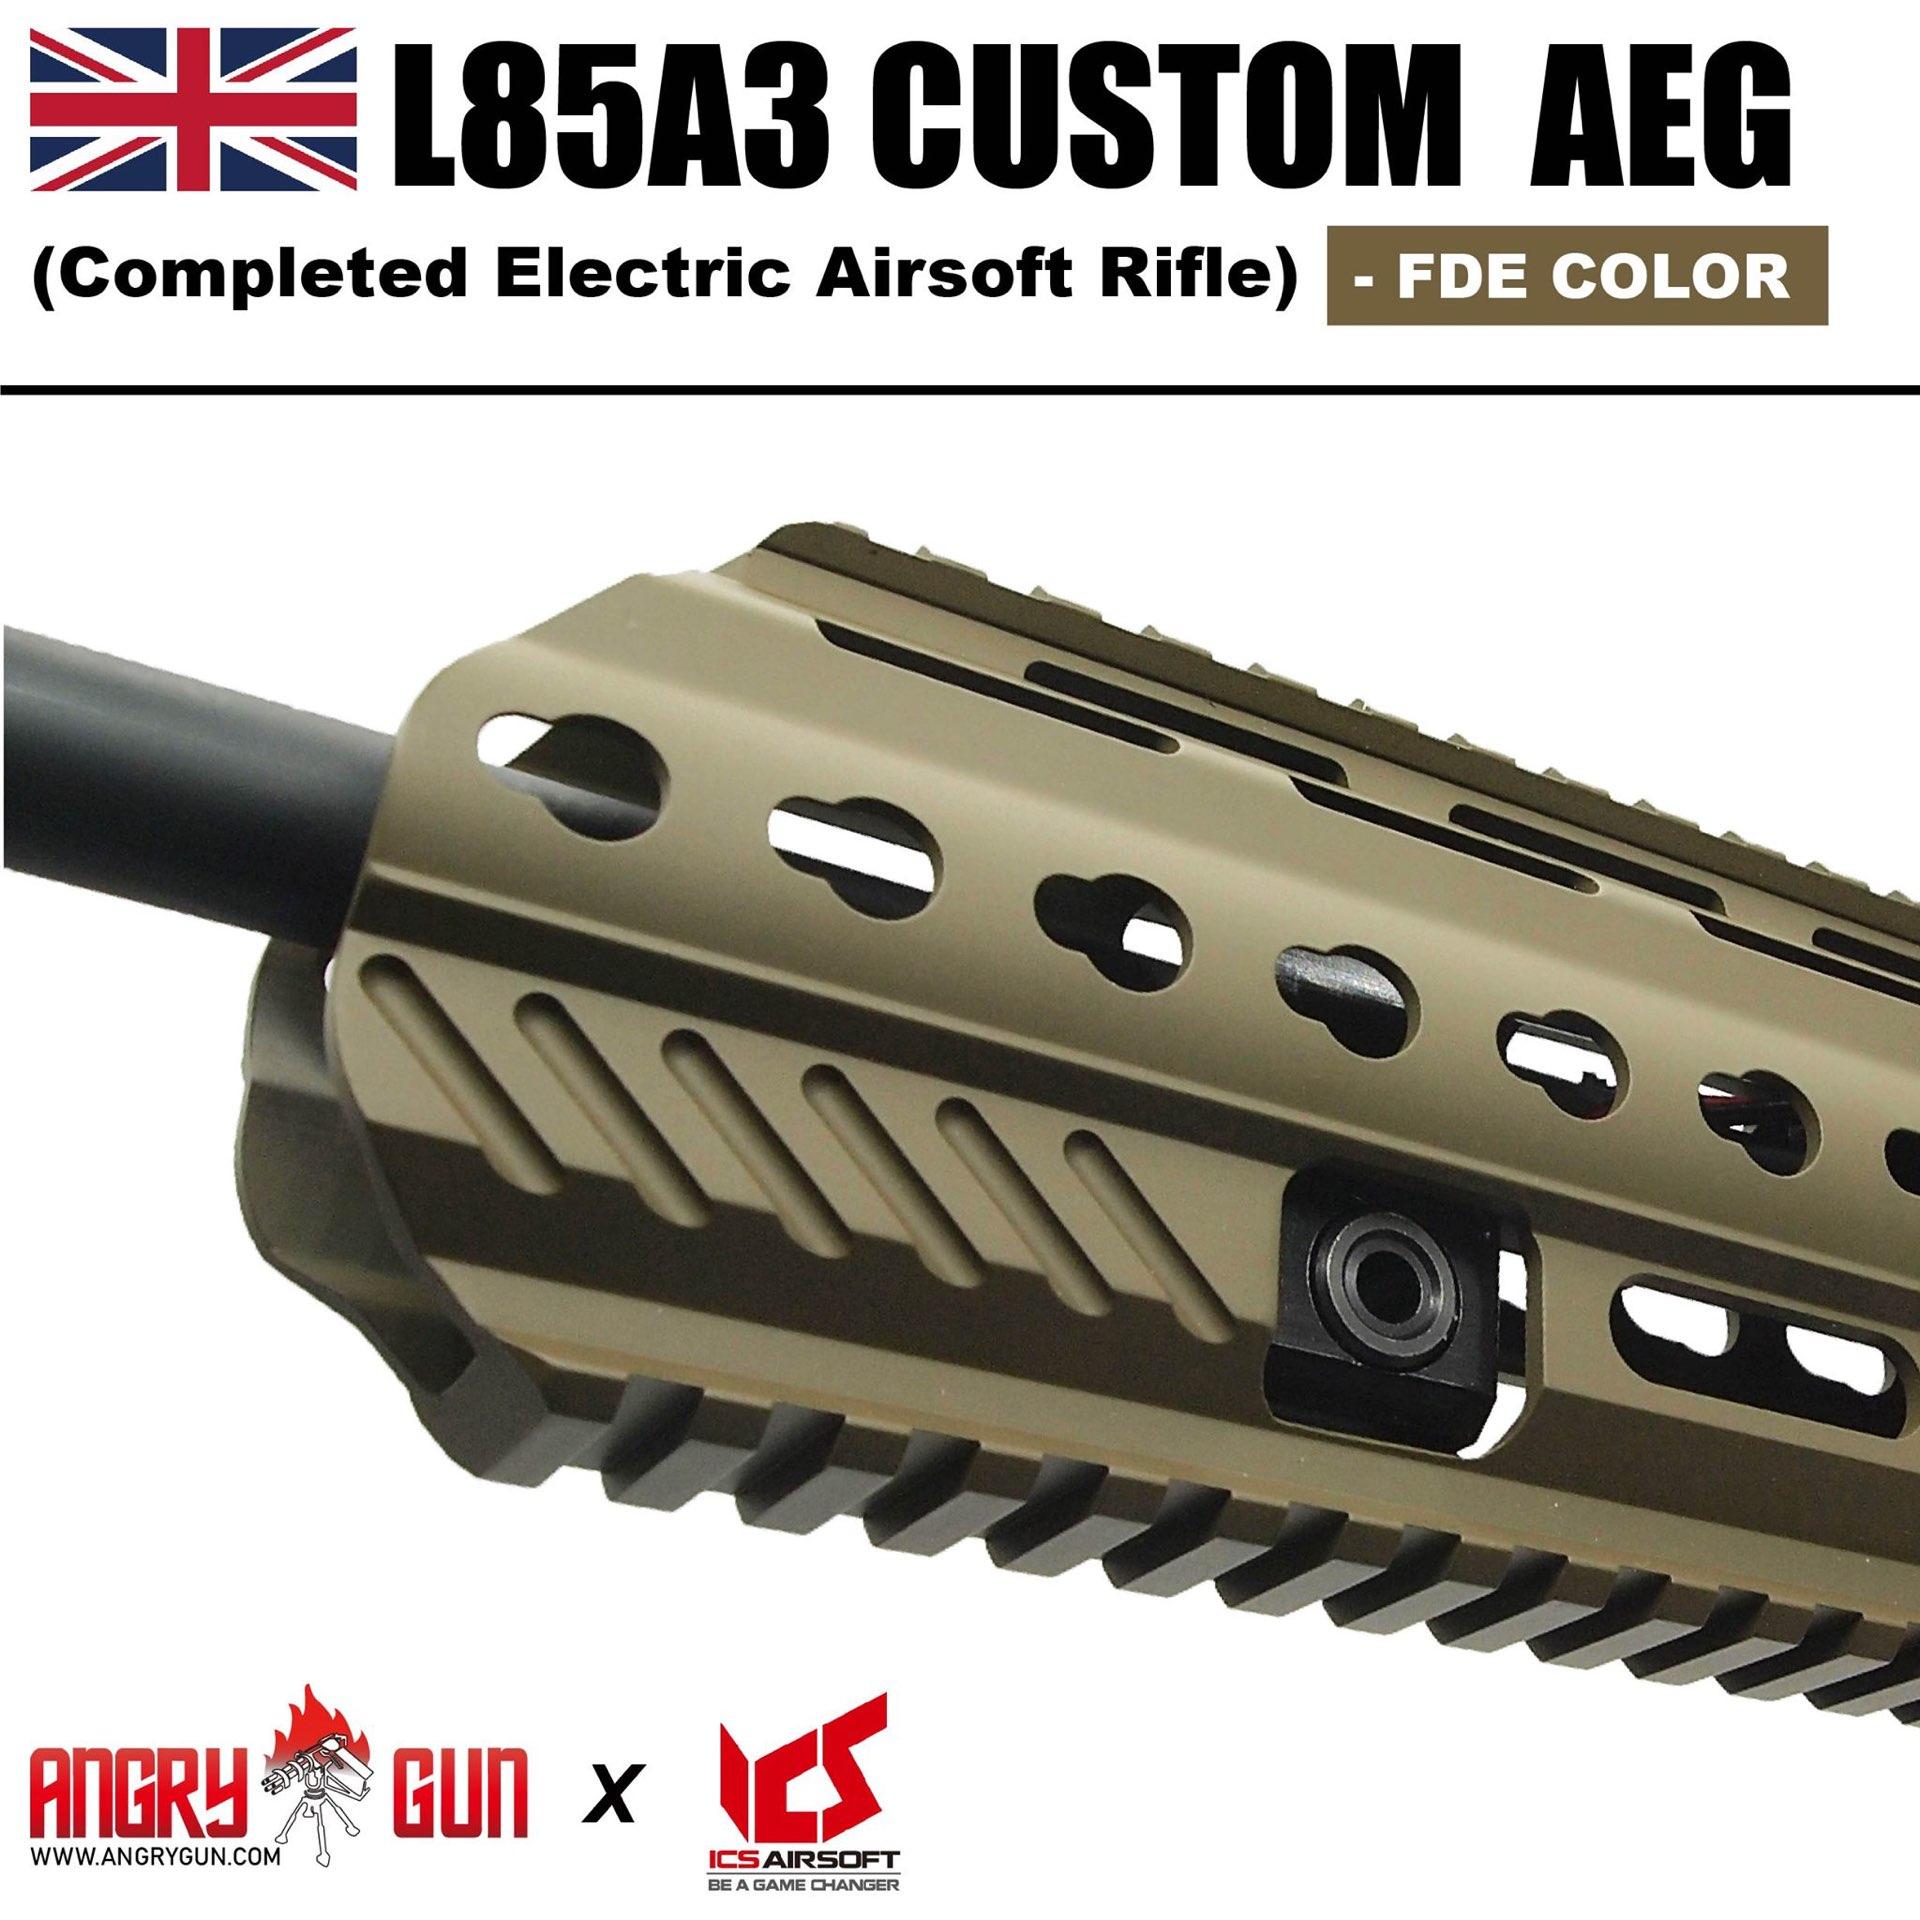 L85A3 - Angry Gun feat. ICS Airsoft